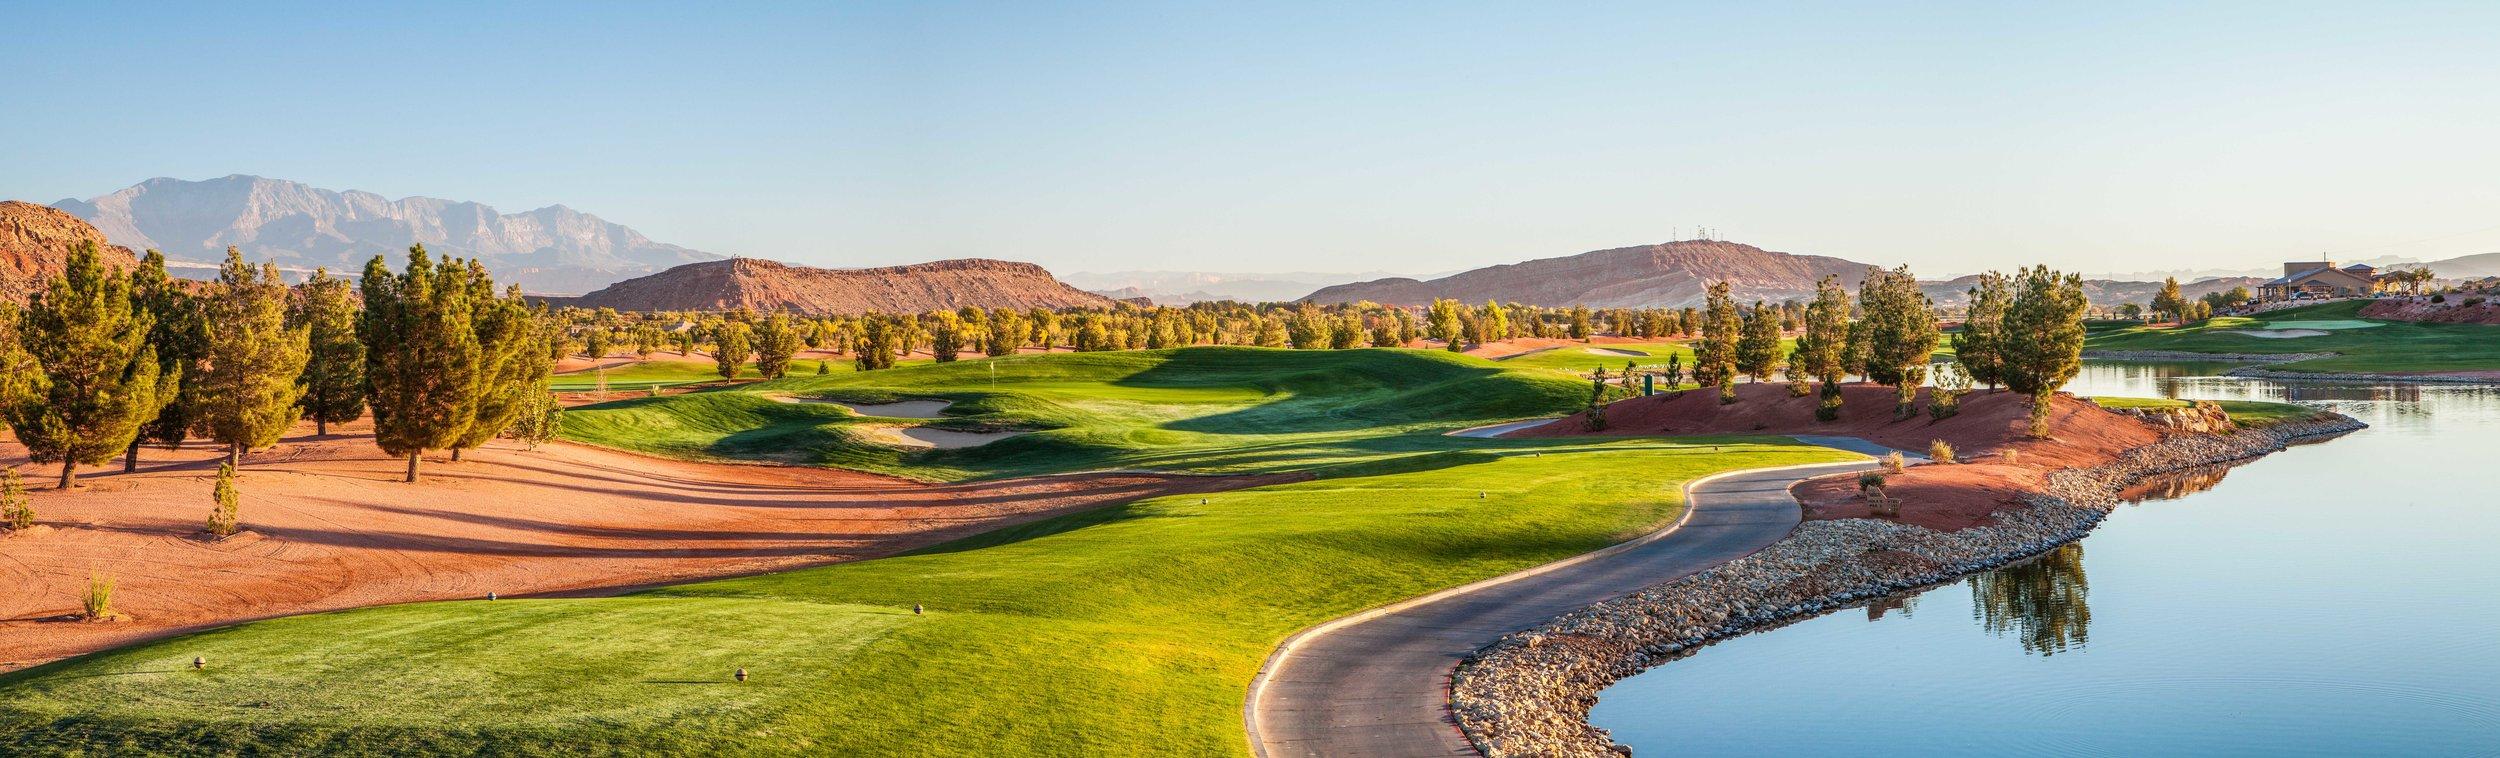 sunriver-golf-st-george-8-revised-1.jpg